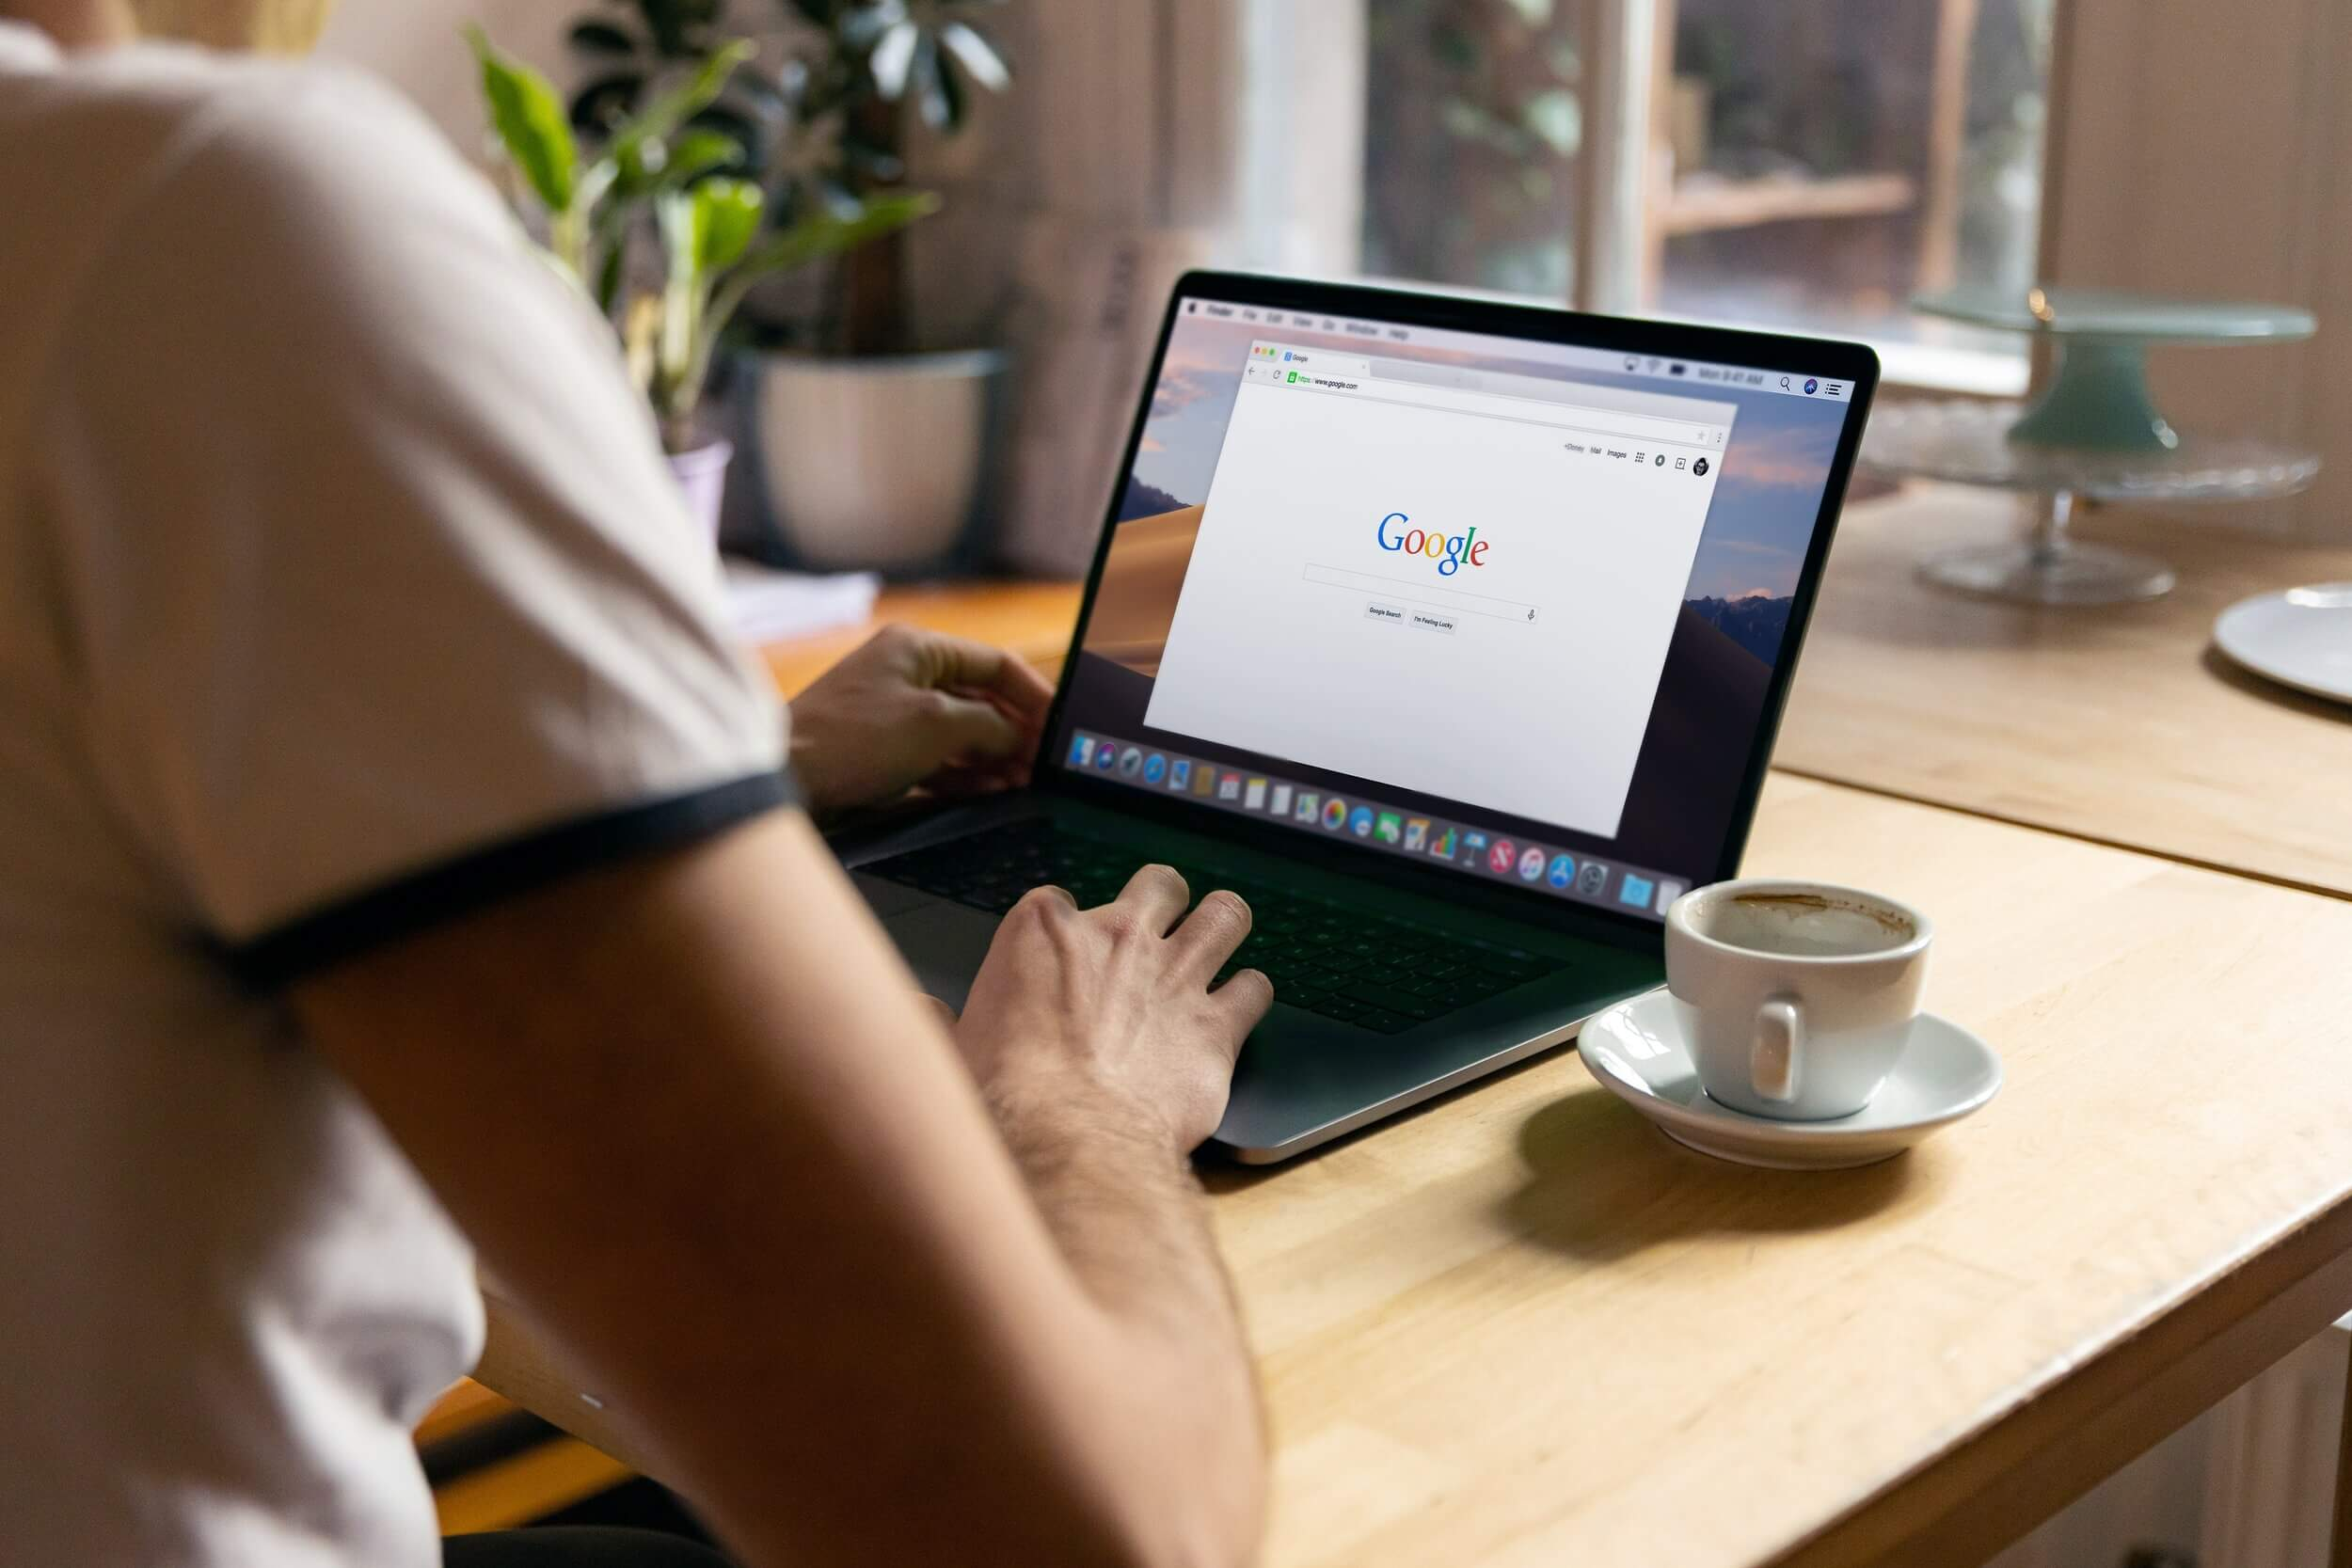 Google's new privacy initiative